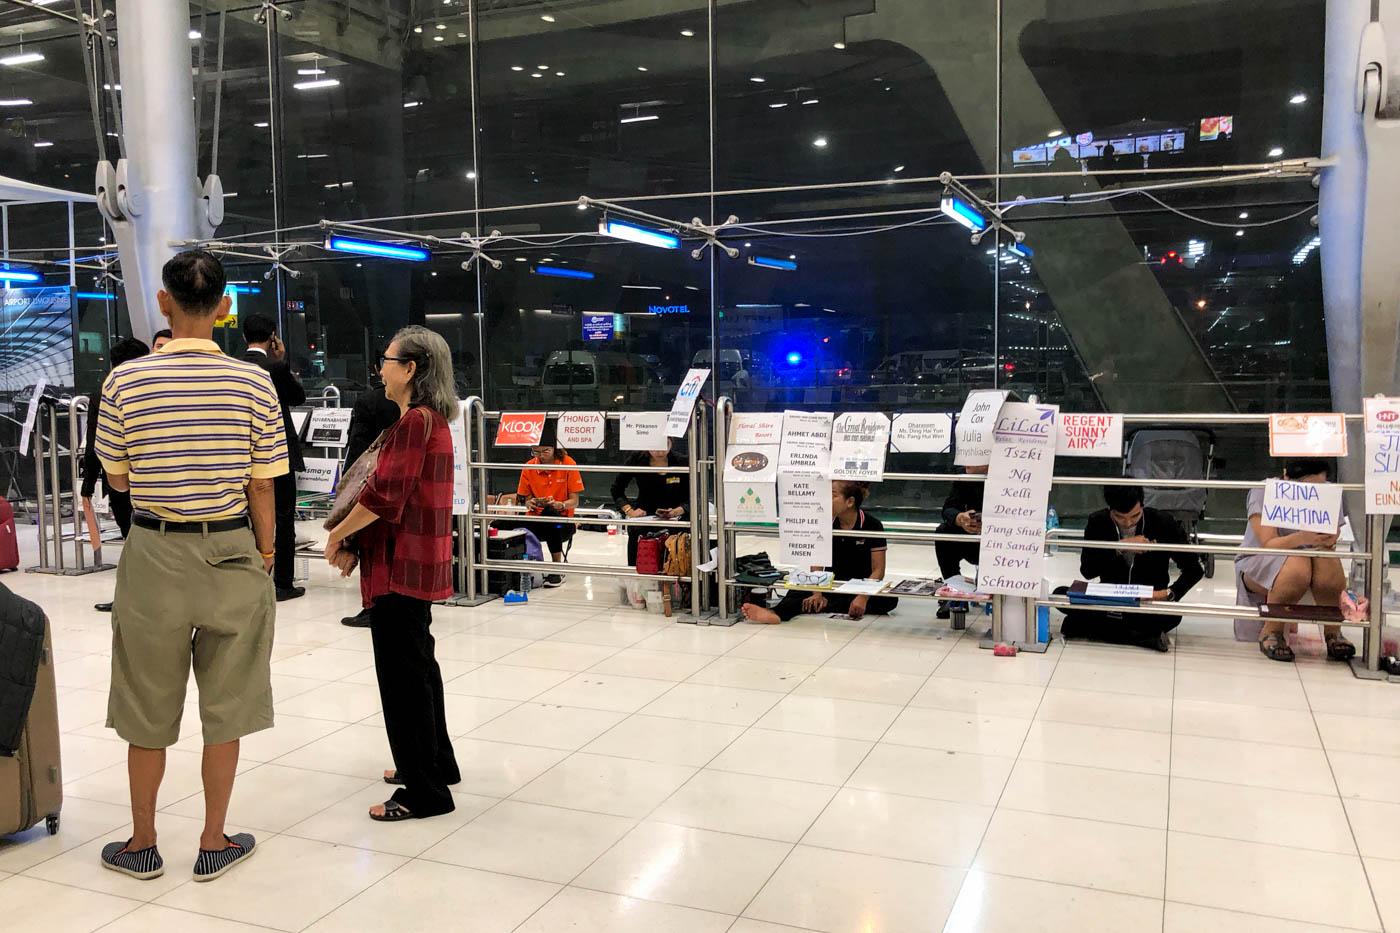 Bangkok Suvarnabhumi Airport Hotel Pick Up Point